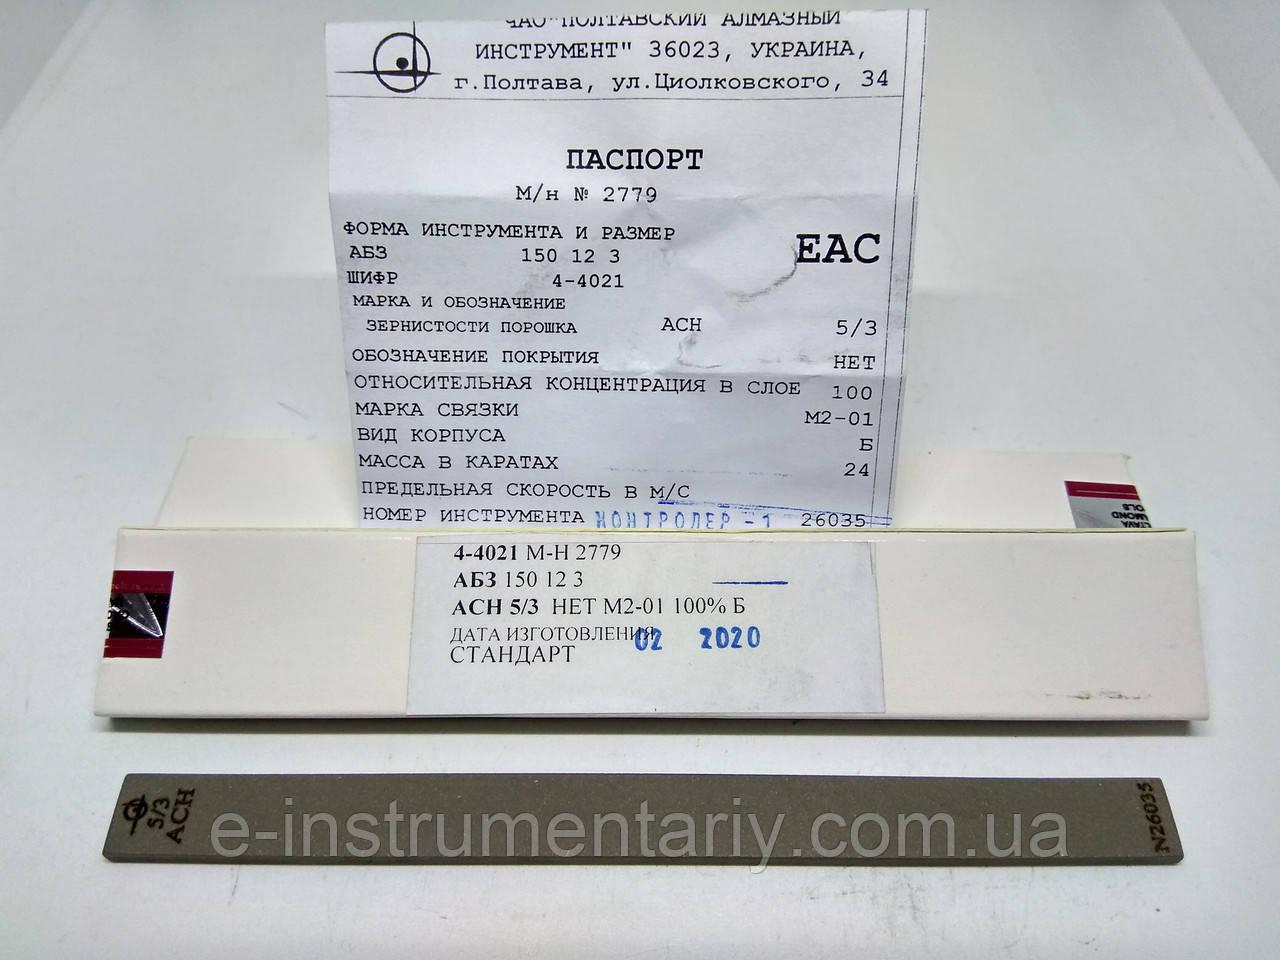 Алмазный брусок 150х12х3  5/3 - полирование